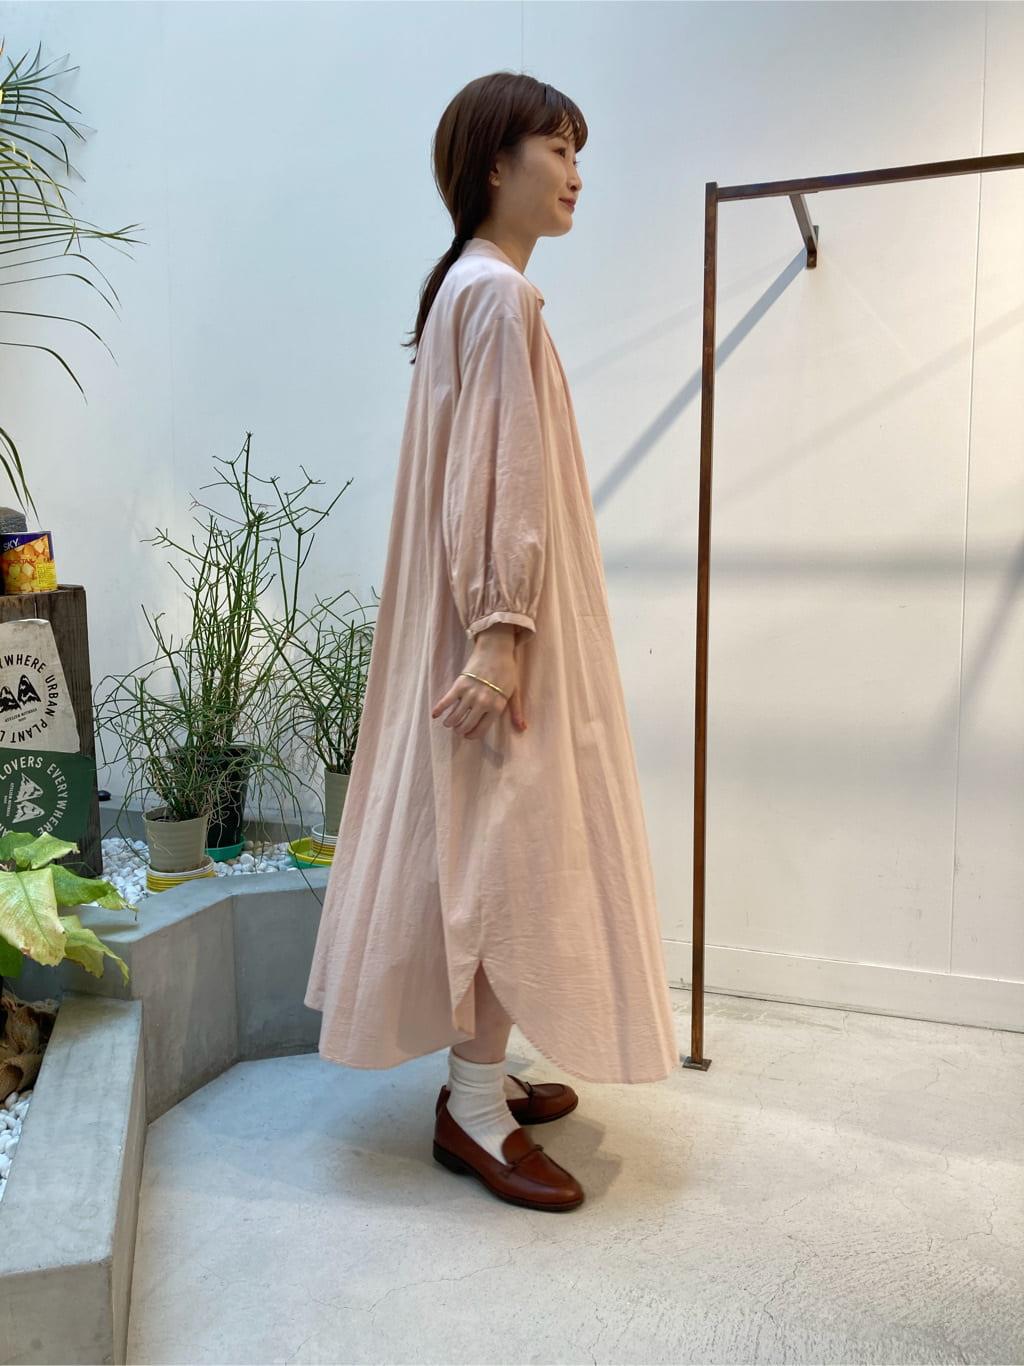 l'atelier du savon 名古屋栄路面 身長:159cm 2021.07.16